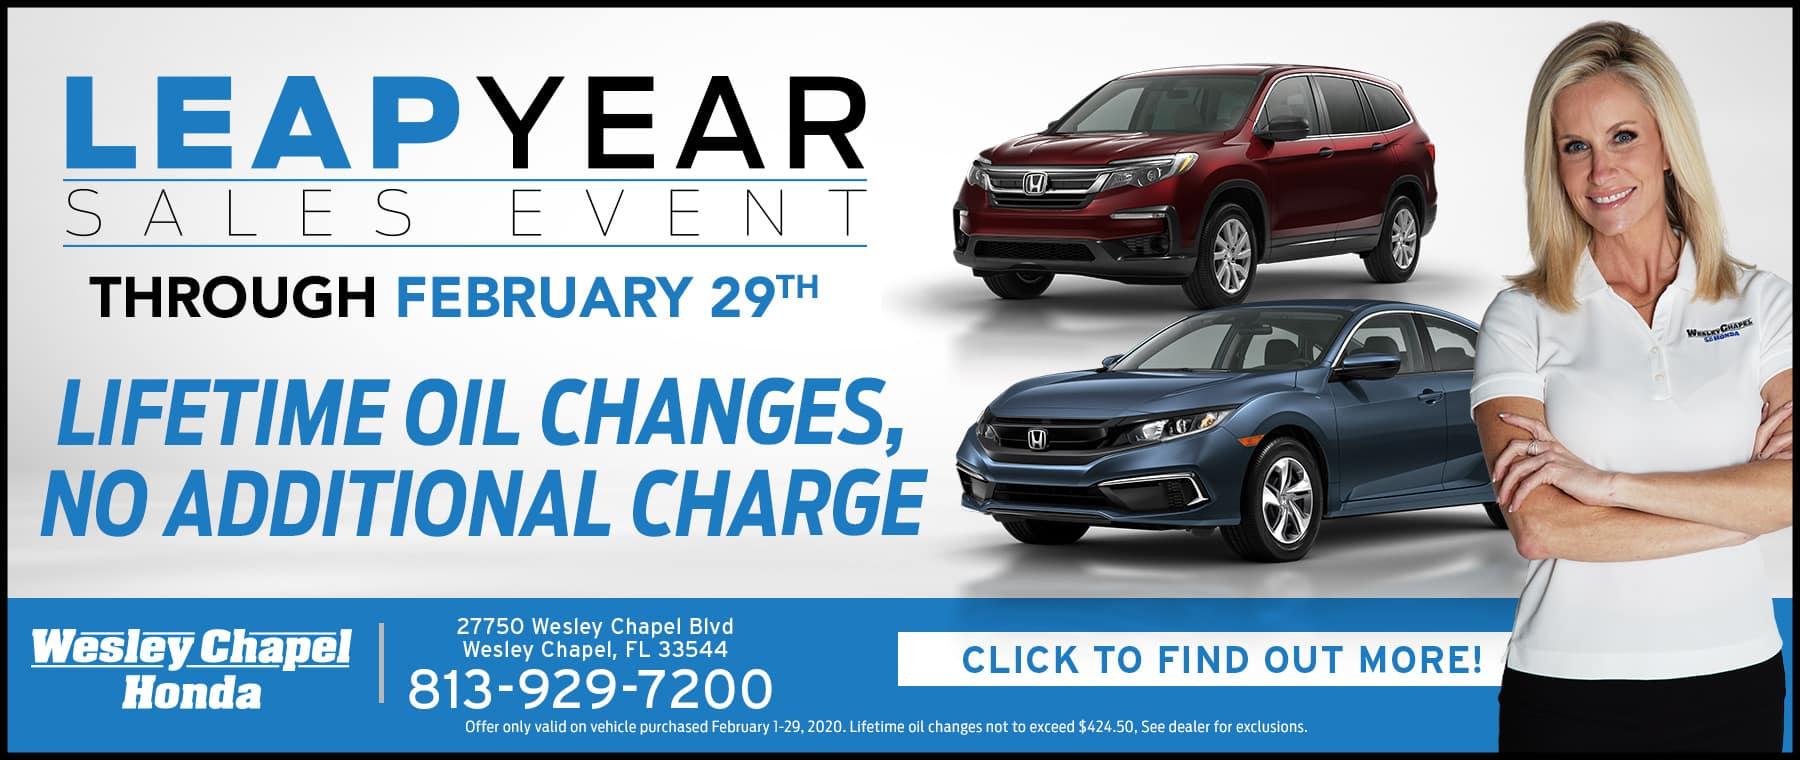 Wesley Chapel Honda Leap Years Sales Event